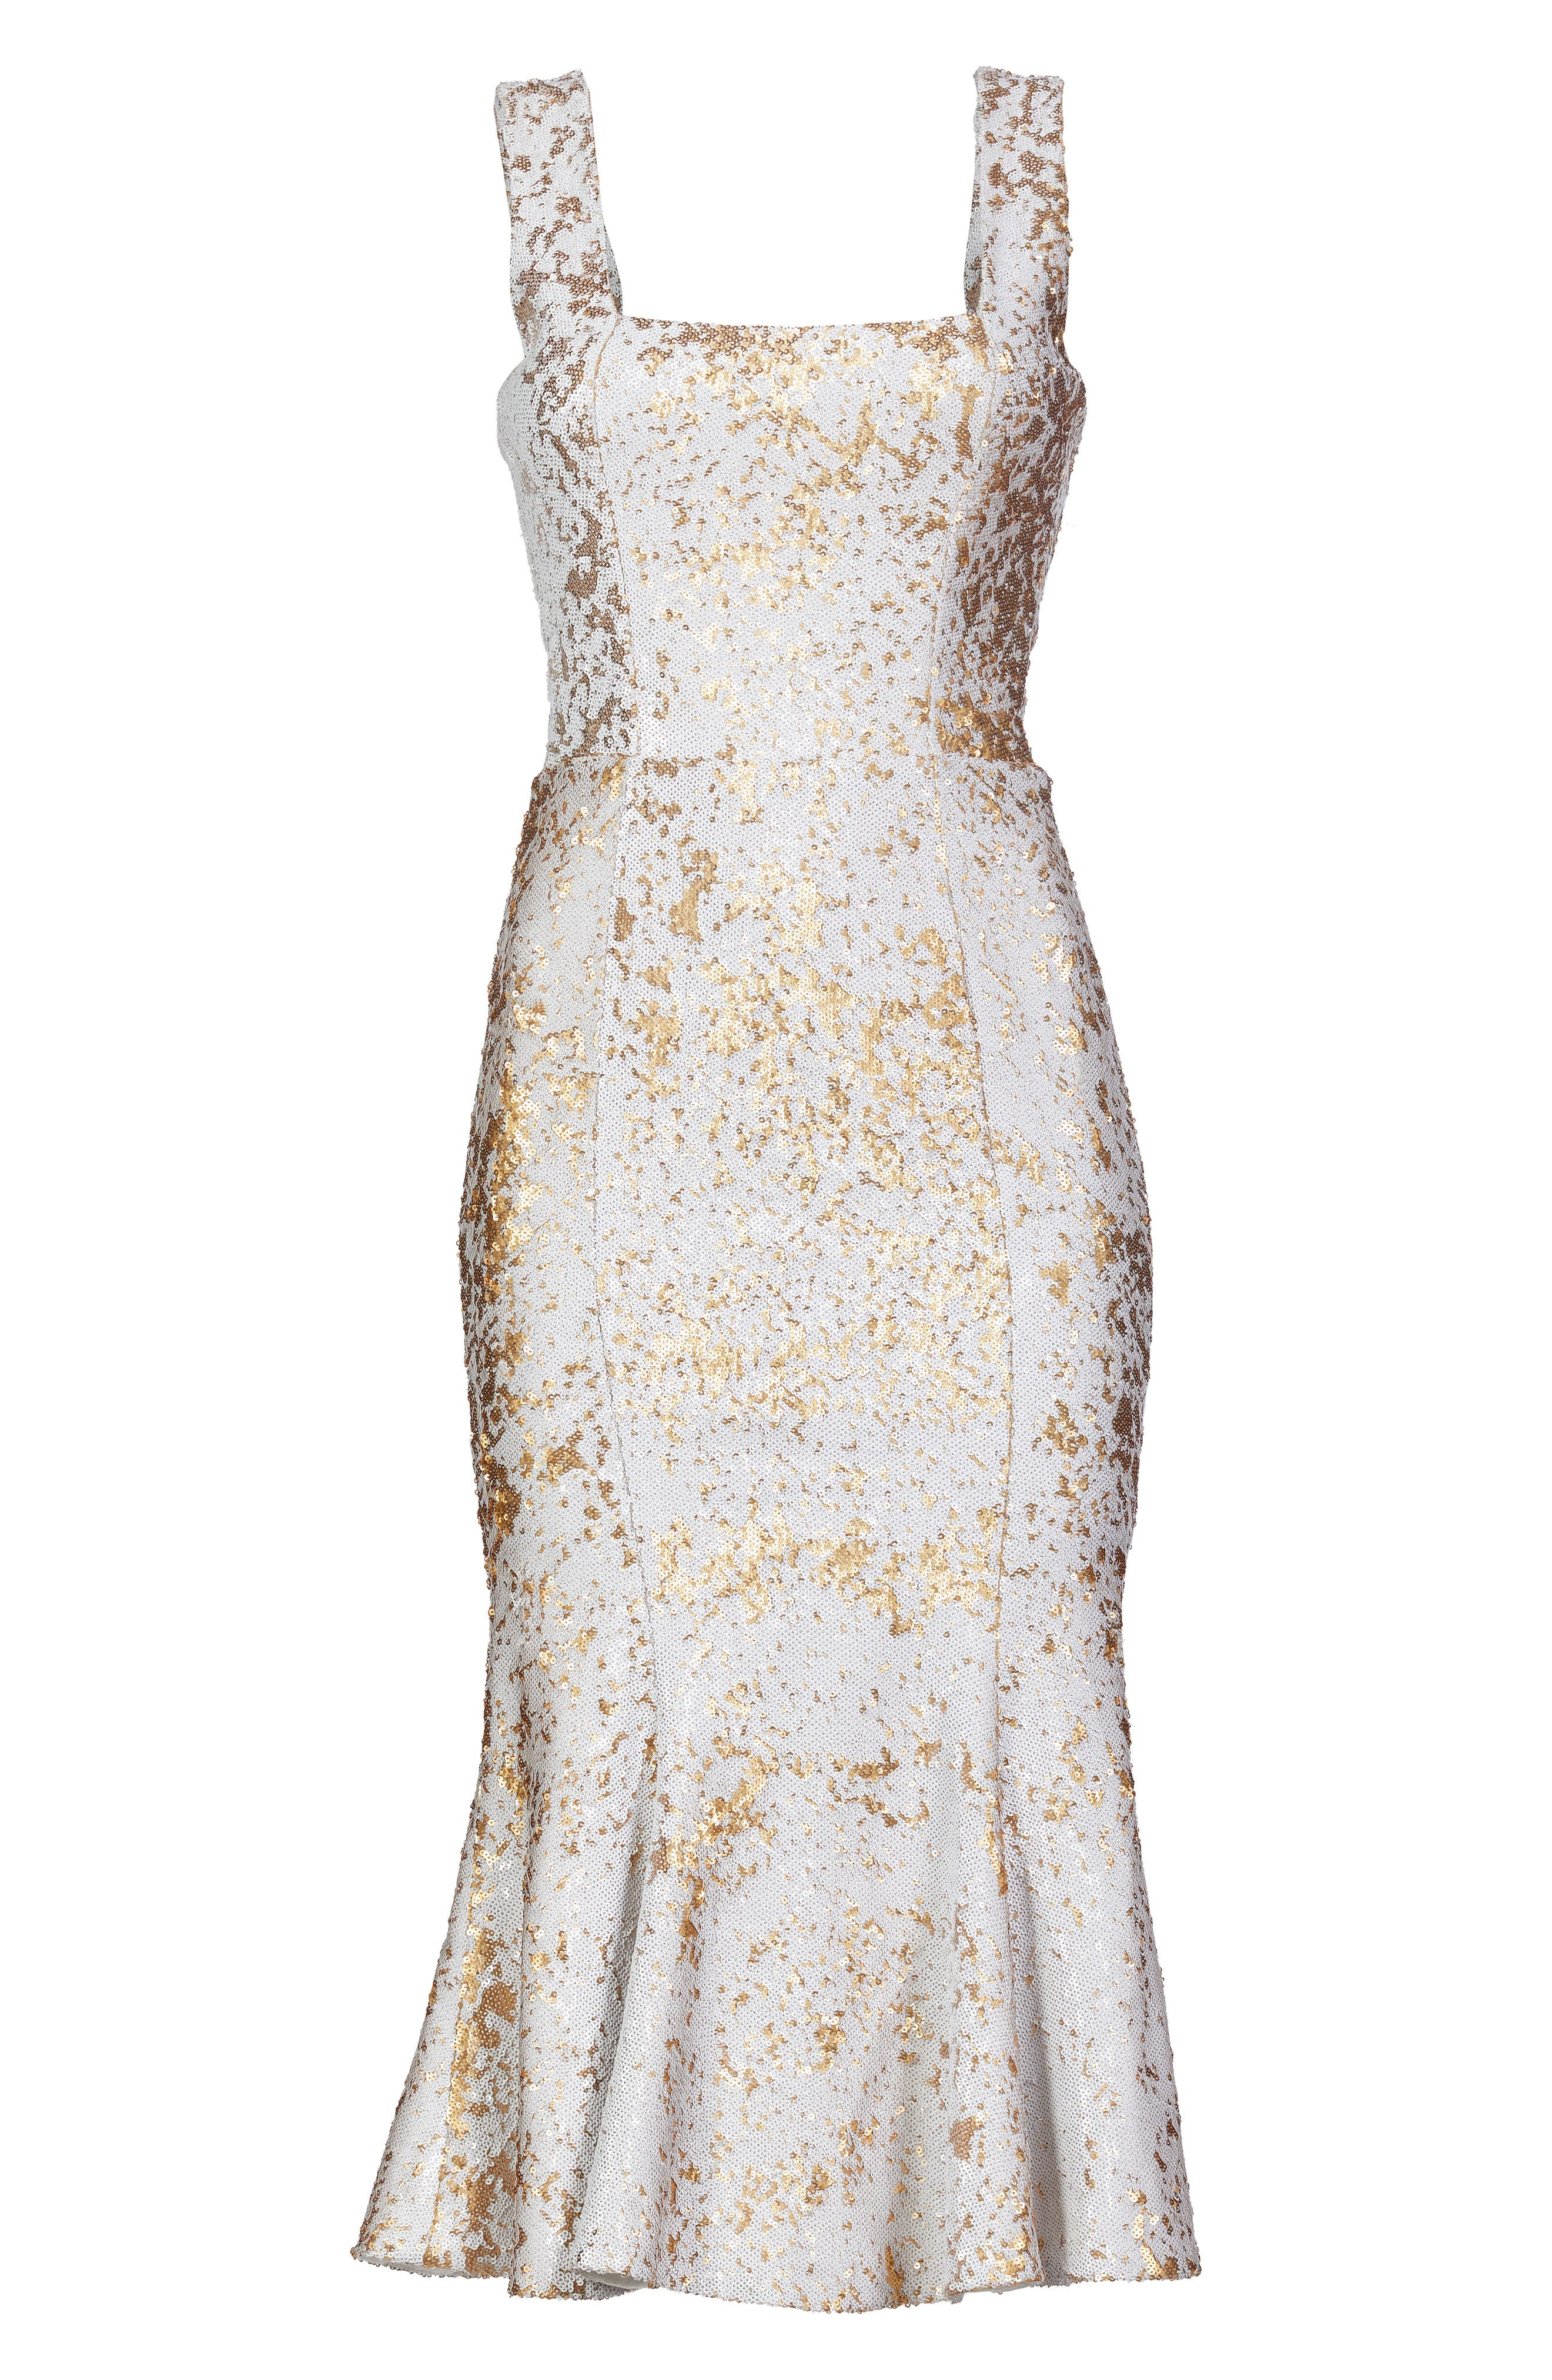 Fiona Sequin Trumpet Dress,                             Alternate thumbnail 5, color,                             White/ Gold